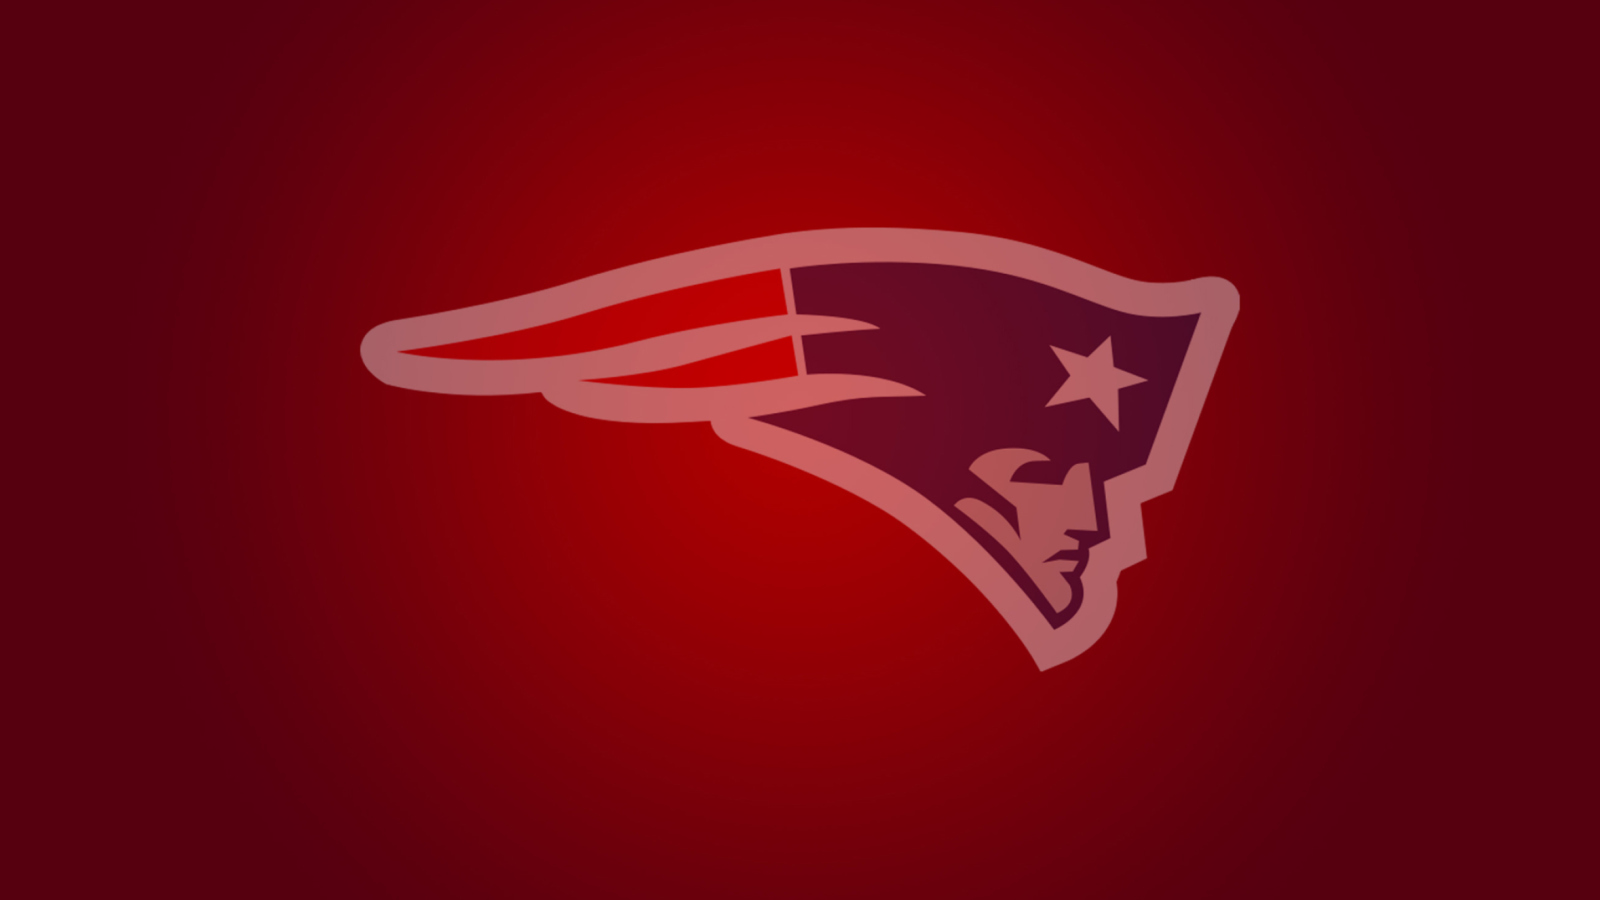 New England Patriots screenshot 1 1600x900